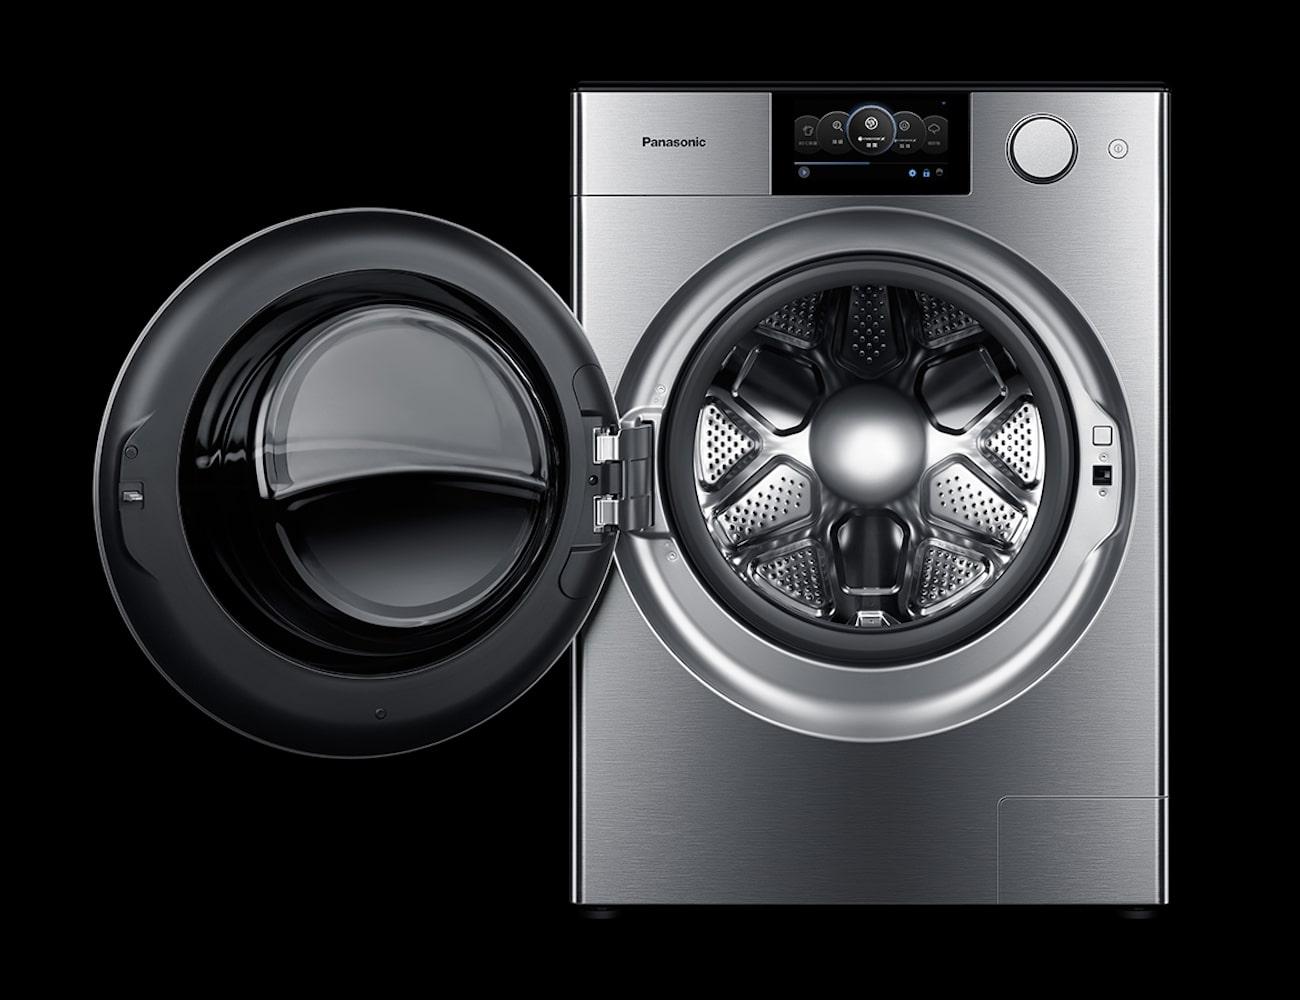 Panasonic Alpha Luxury Washing Machine » Gadget Flow on Washing Machine  id=77154